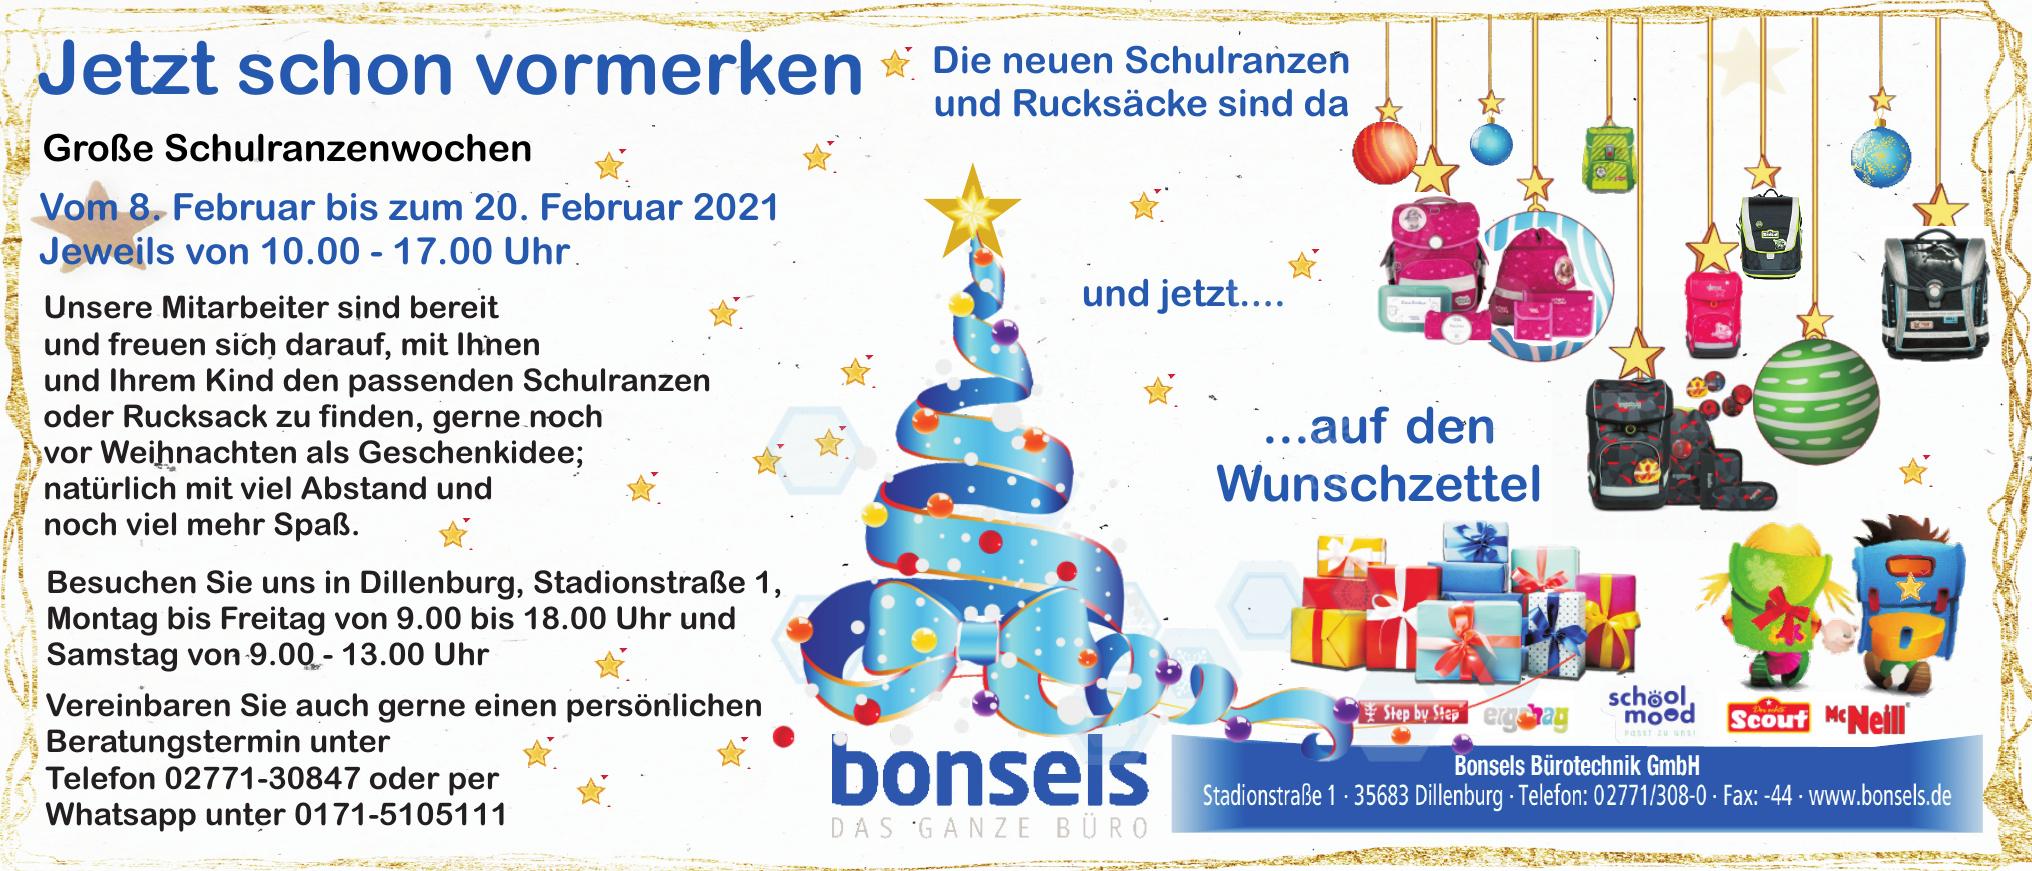 Hörgeräte Bonsel GmbH